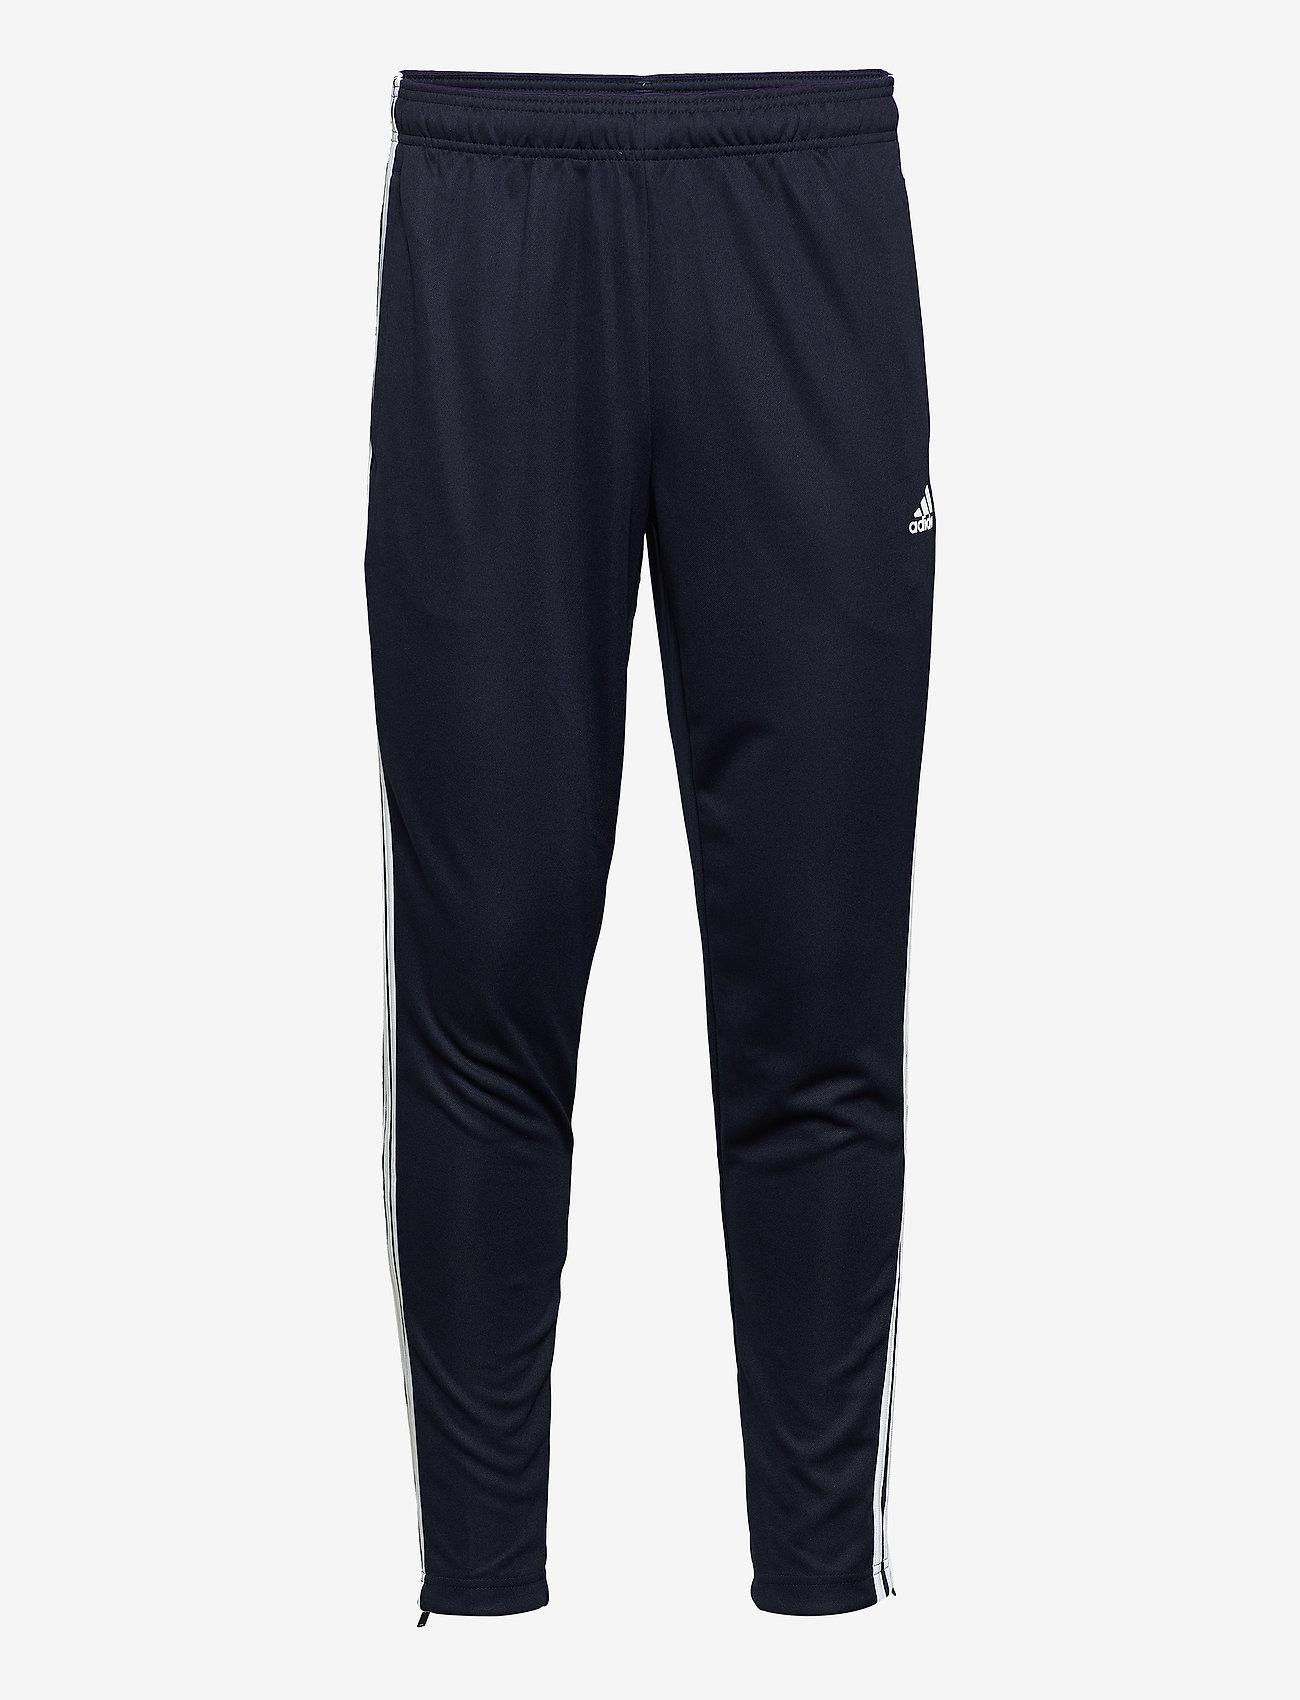 Mts Athl Tiro (Legink) (56 €) - adidas Performance zlYgv